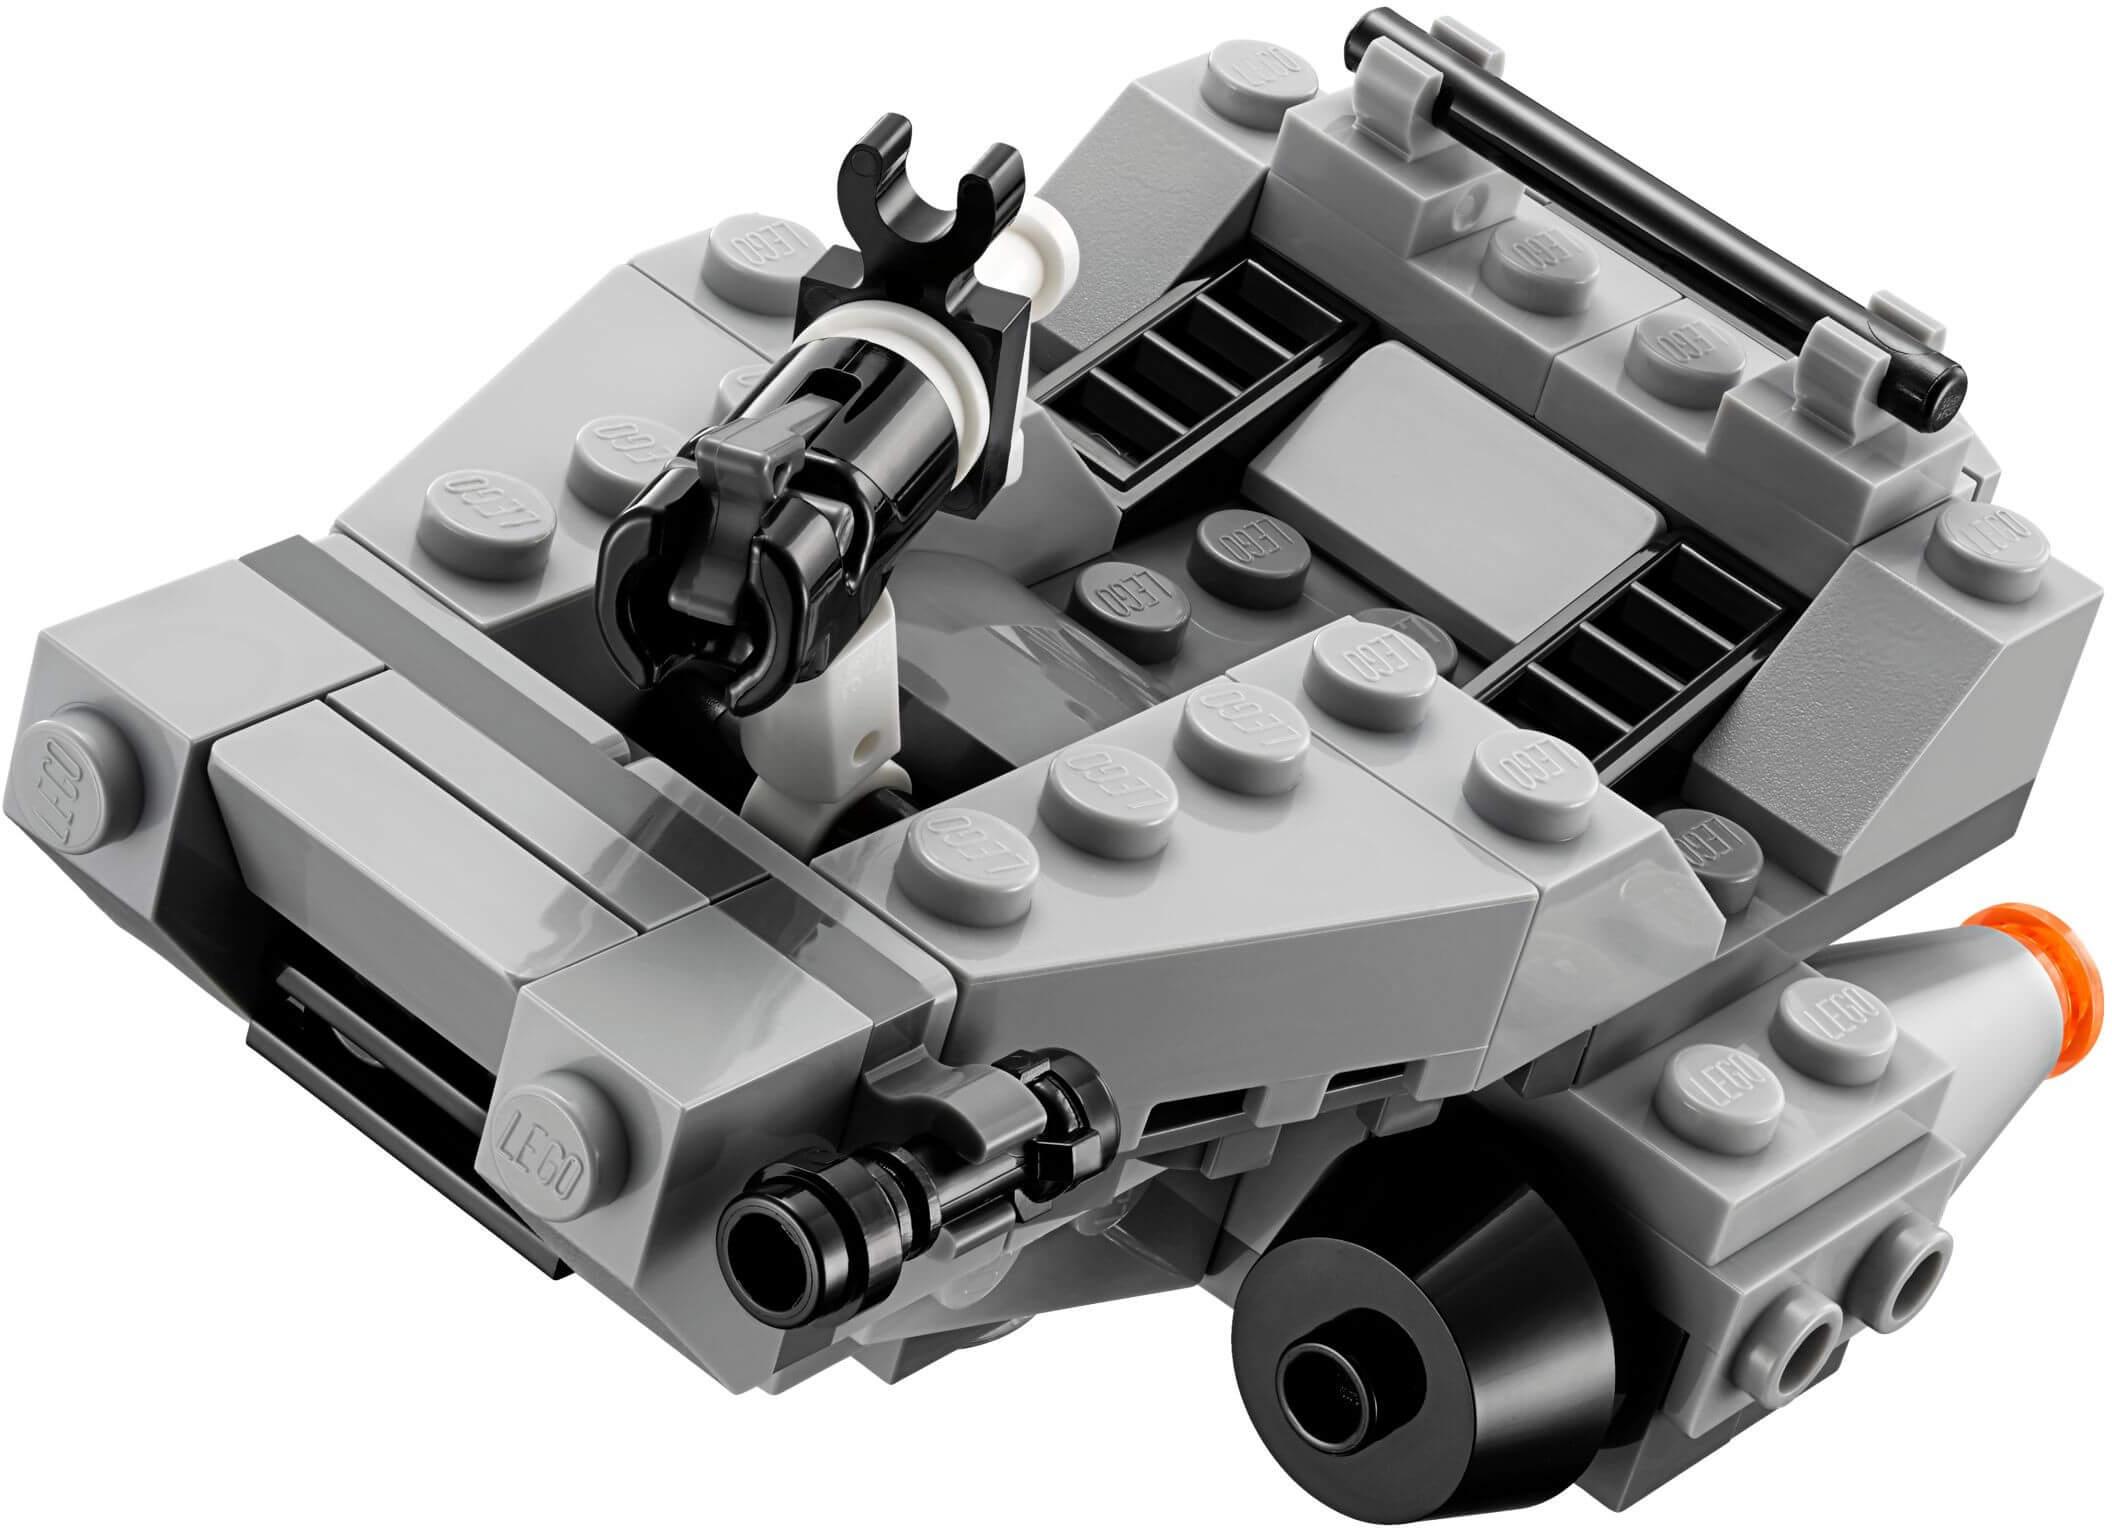 Mua đồ chơi LEGO 75125 - LEGO Star Wars 75125 - Máy Bay X-Wing của quân Kháng Chiến (LEGO Star Wars Resistance X-Wing Fighter 75125)